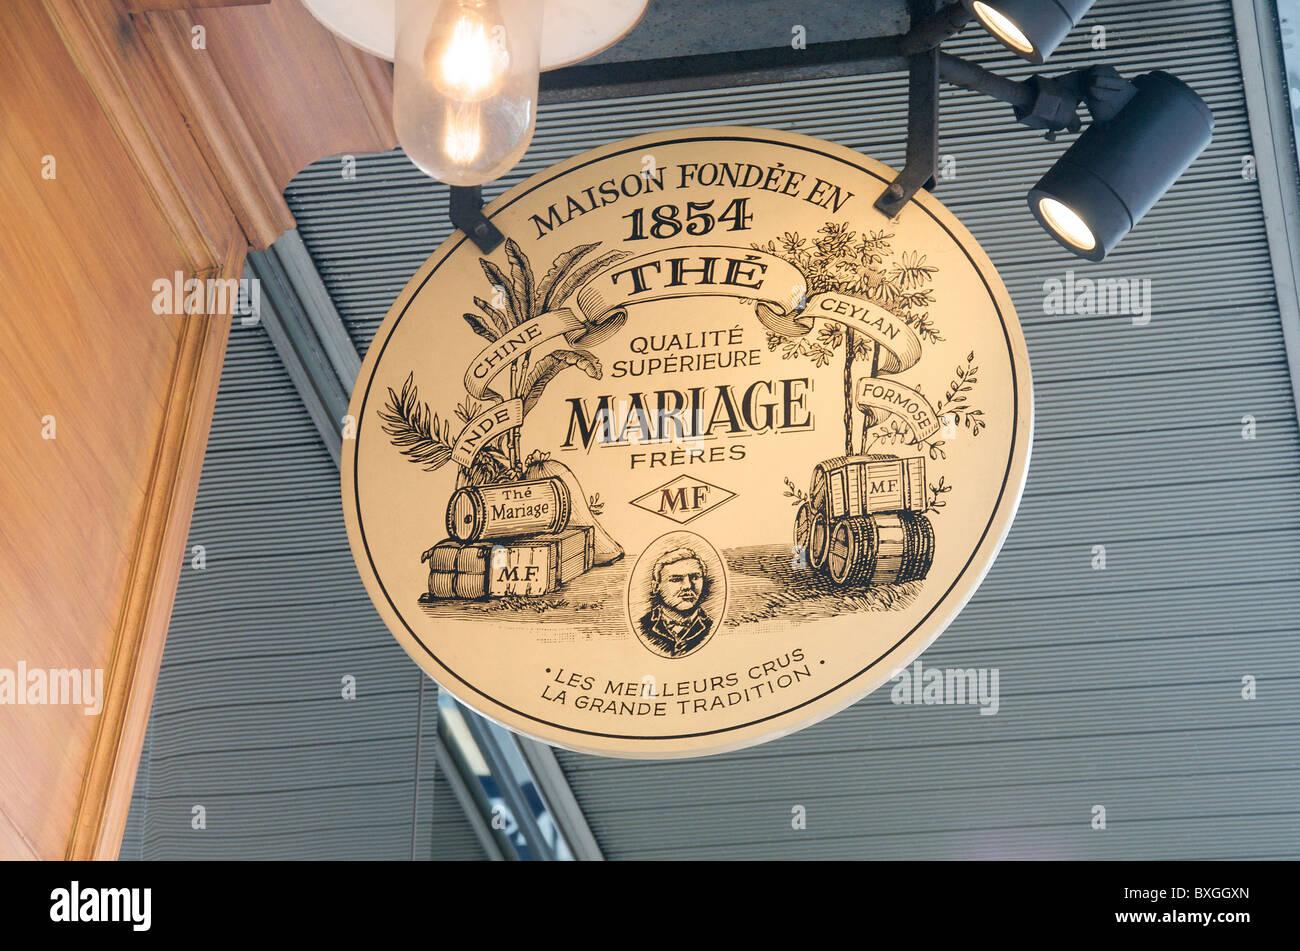 Mariage Frères store, Shinjuku, Tokyo, Japan - Stock Image